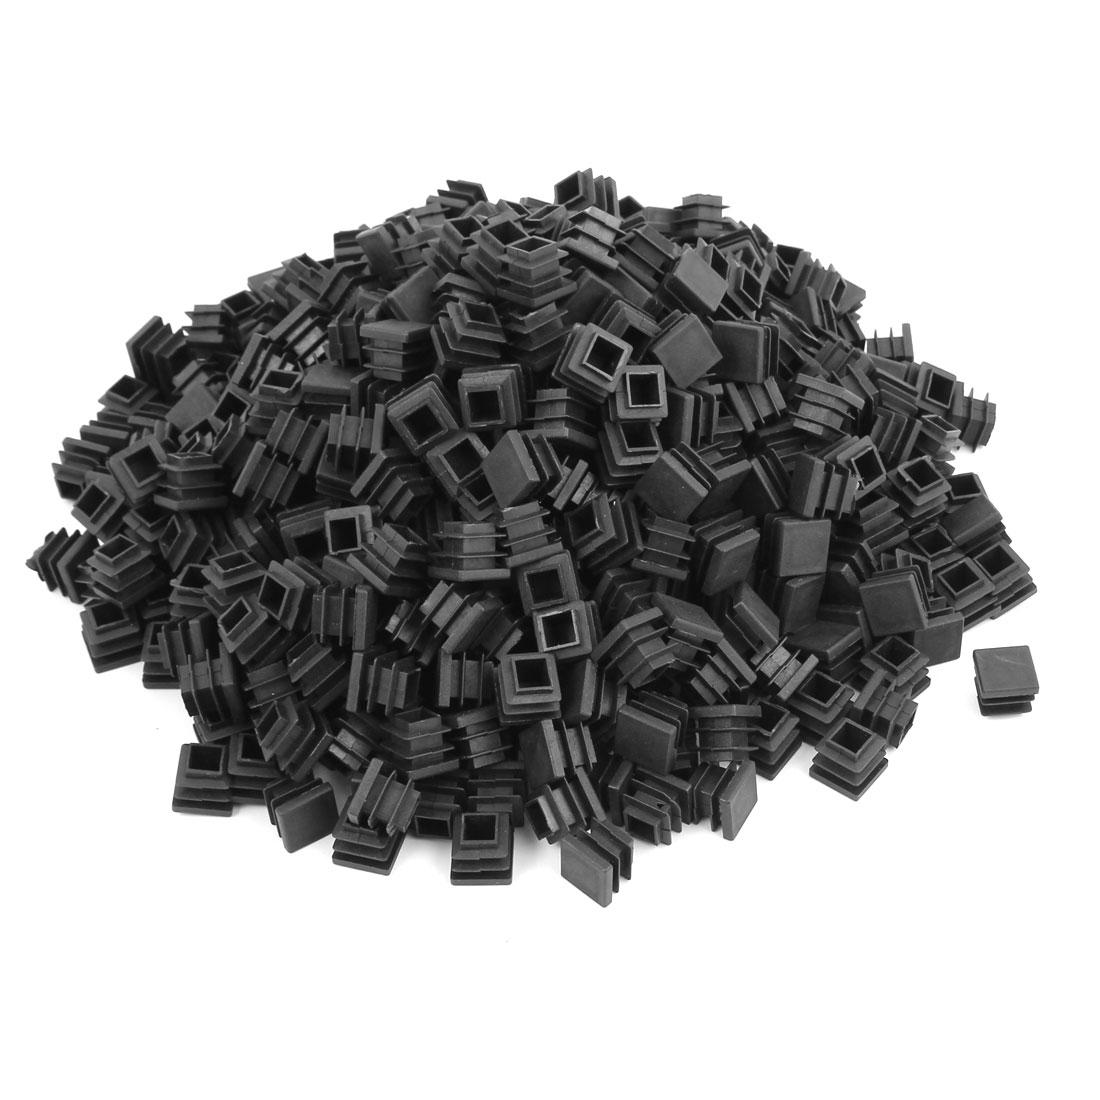 Plastic Square Tube Pipe Inserts End Blanking Caps Black 16mmx16mm 500pcs